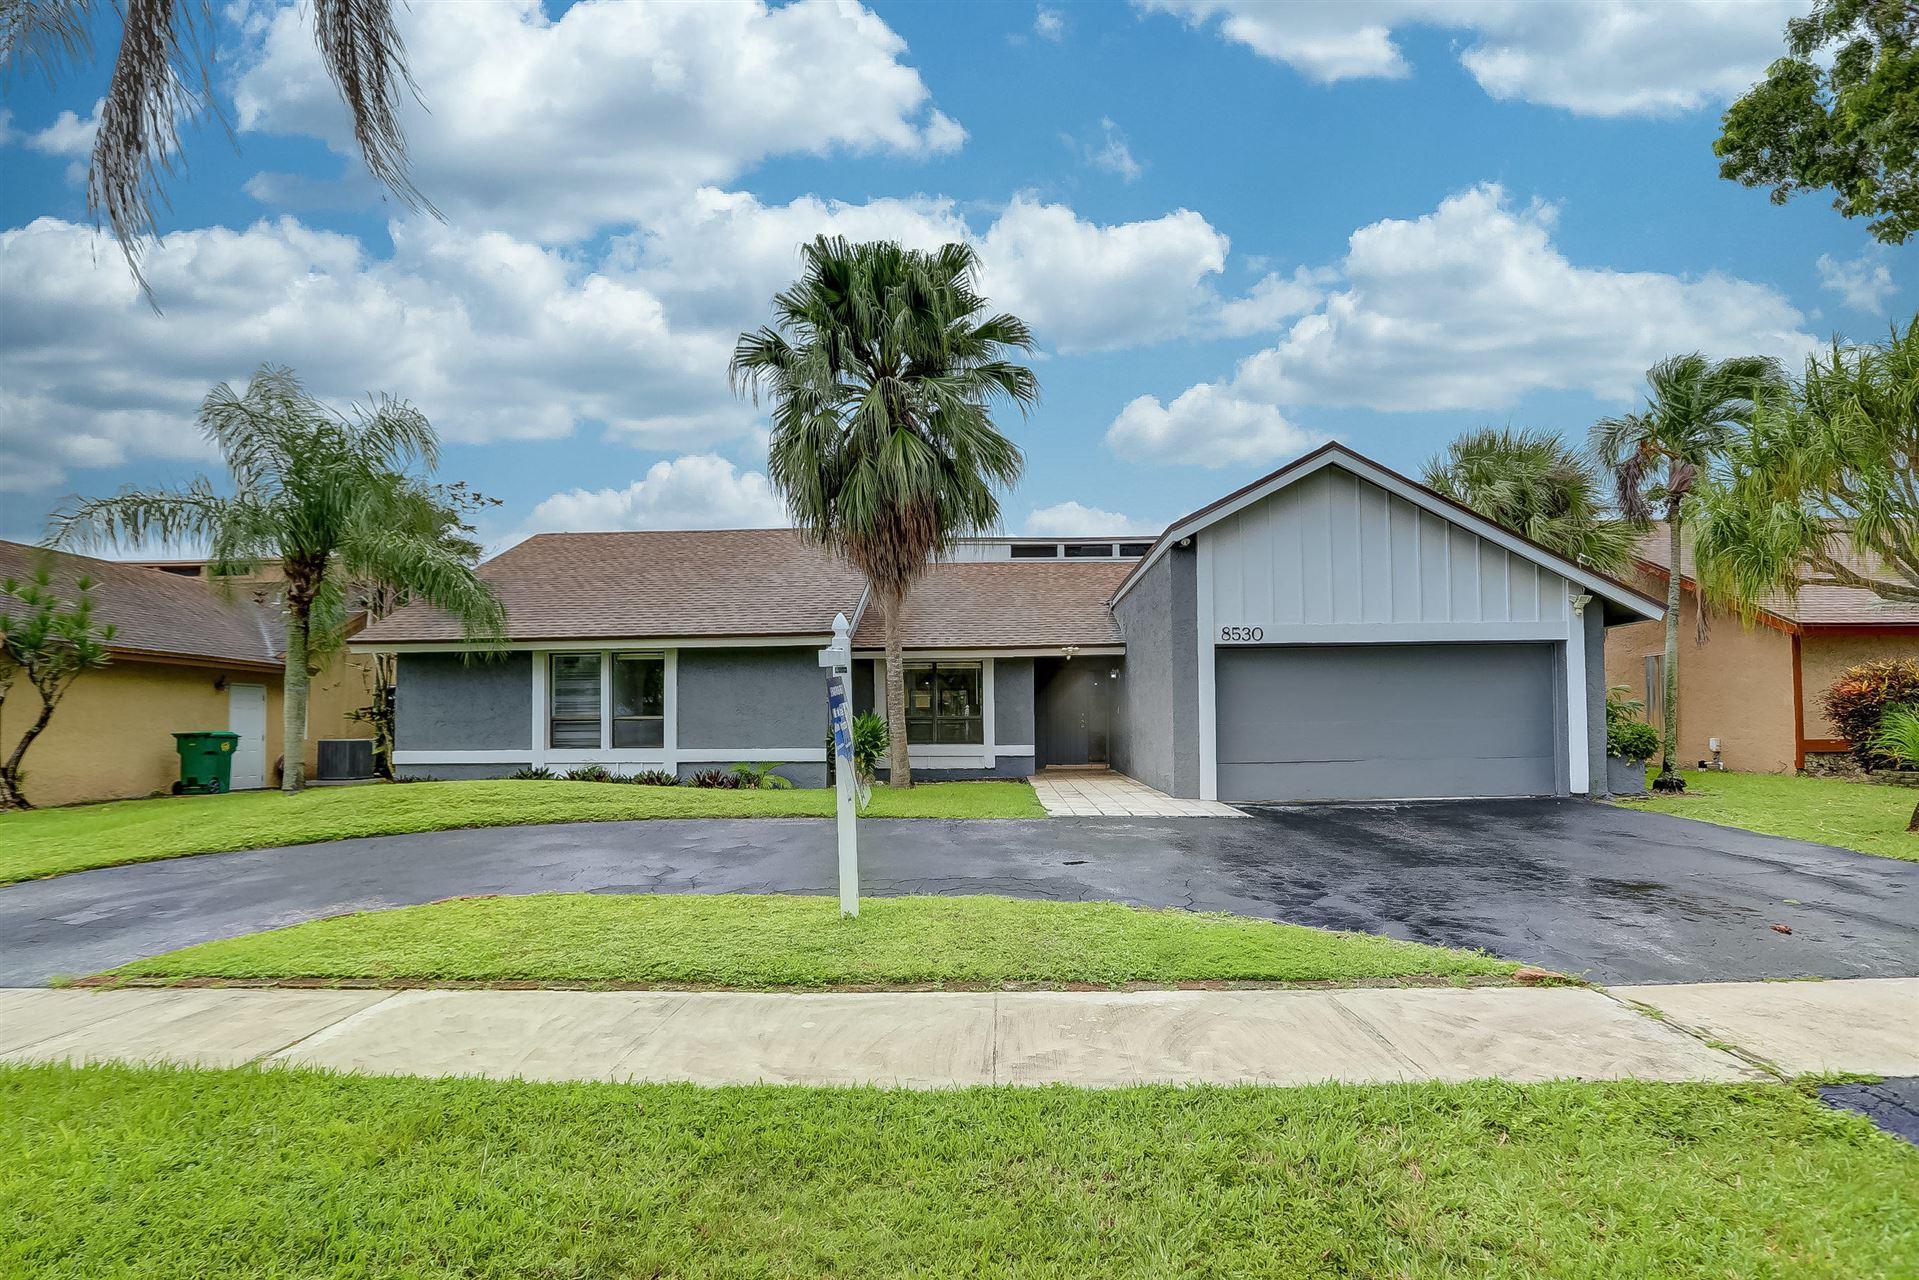 Photo of 8530 NW 51st Court, Lauderhill, FL 33351 (MLS # RX-10656096)